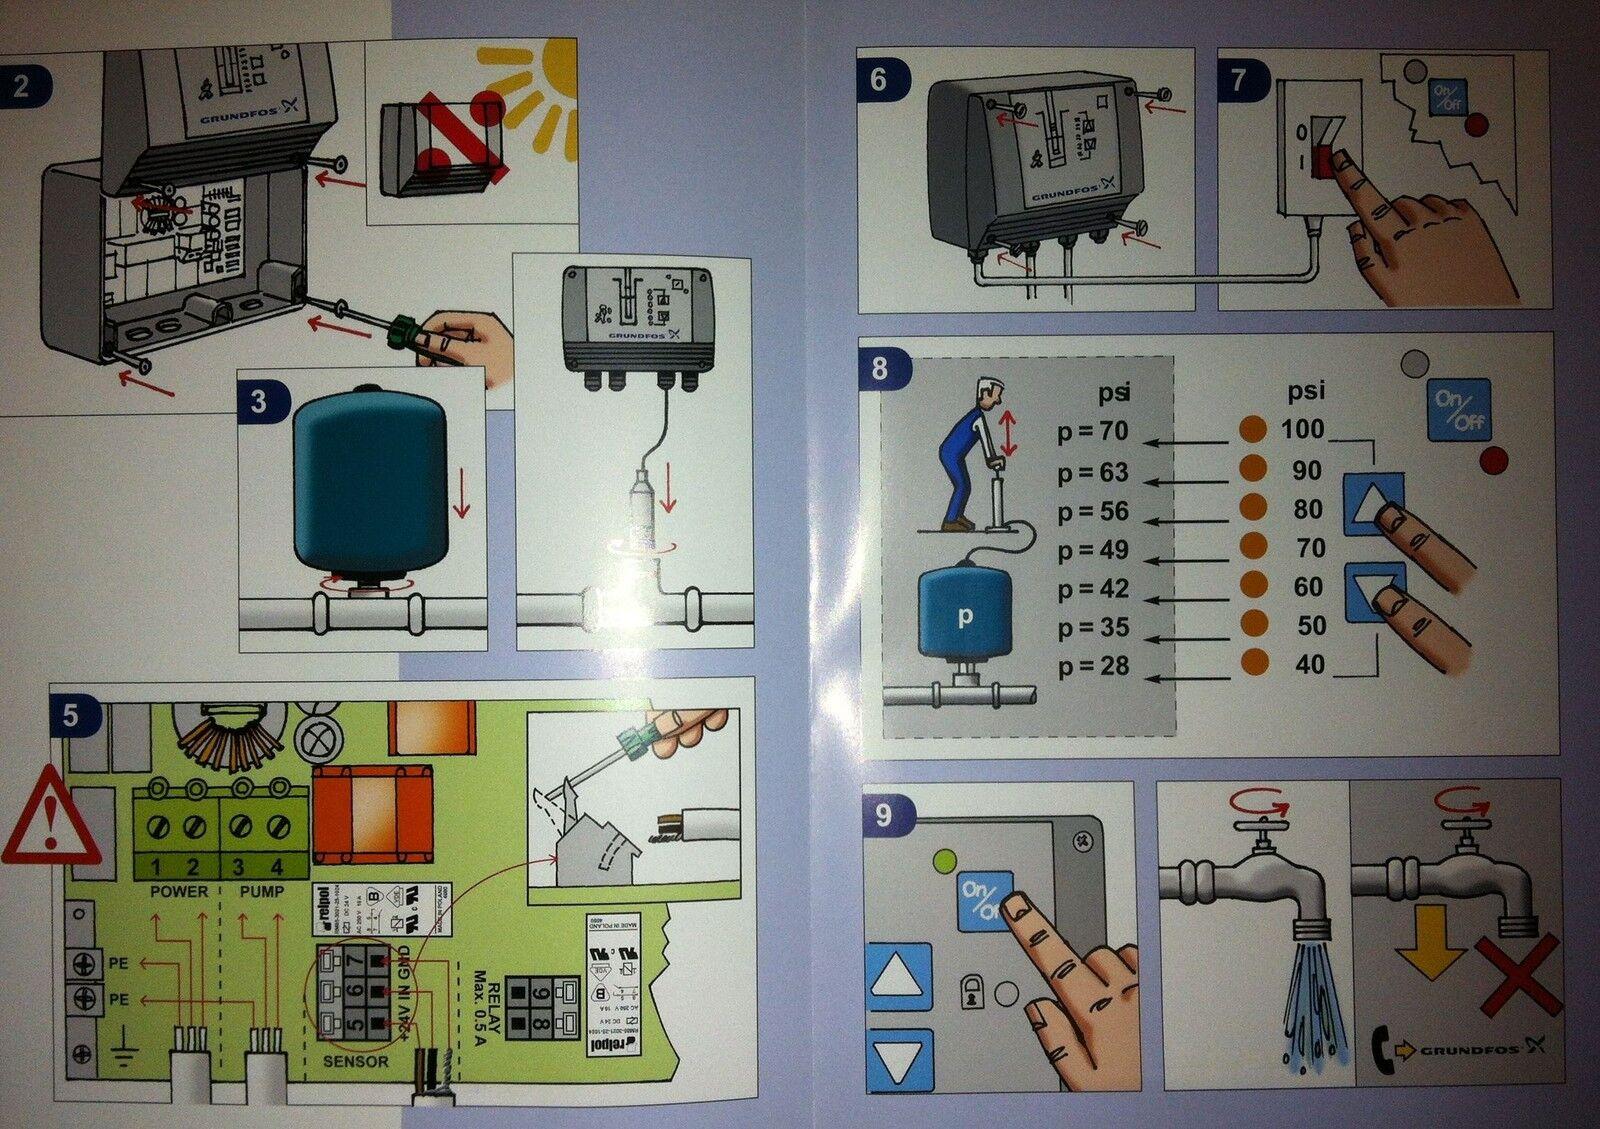 Grundfos Cu301 Wiring Diagram Complete Diagrams Instructions Sqe Control Unit With W Transducer Ebay Rh Com Manual